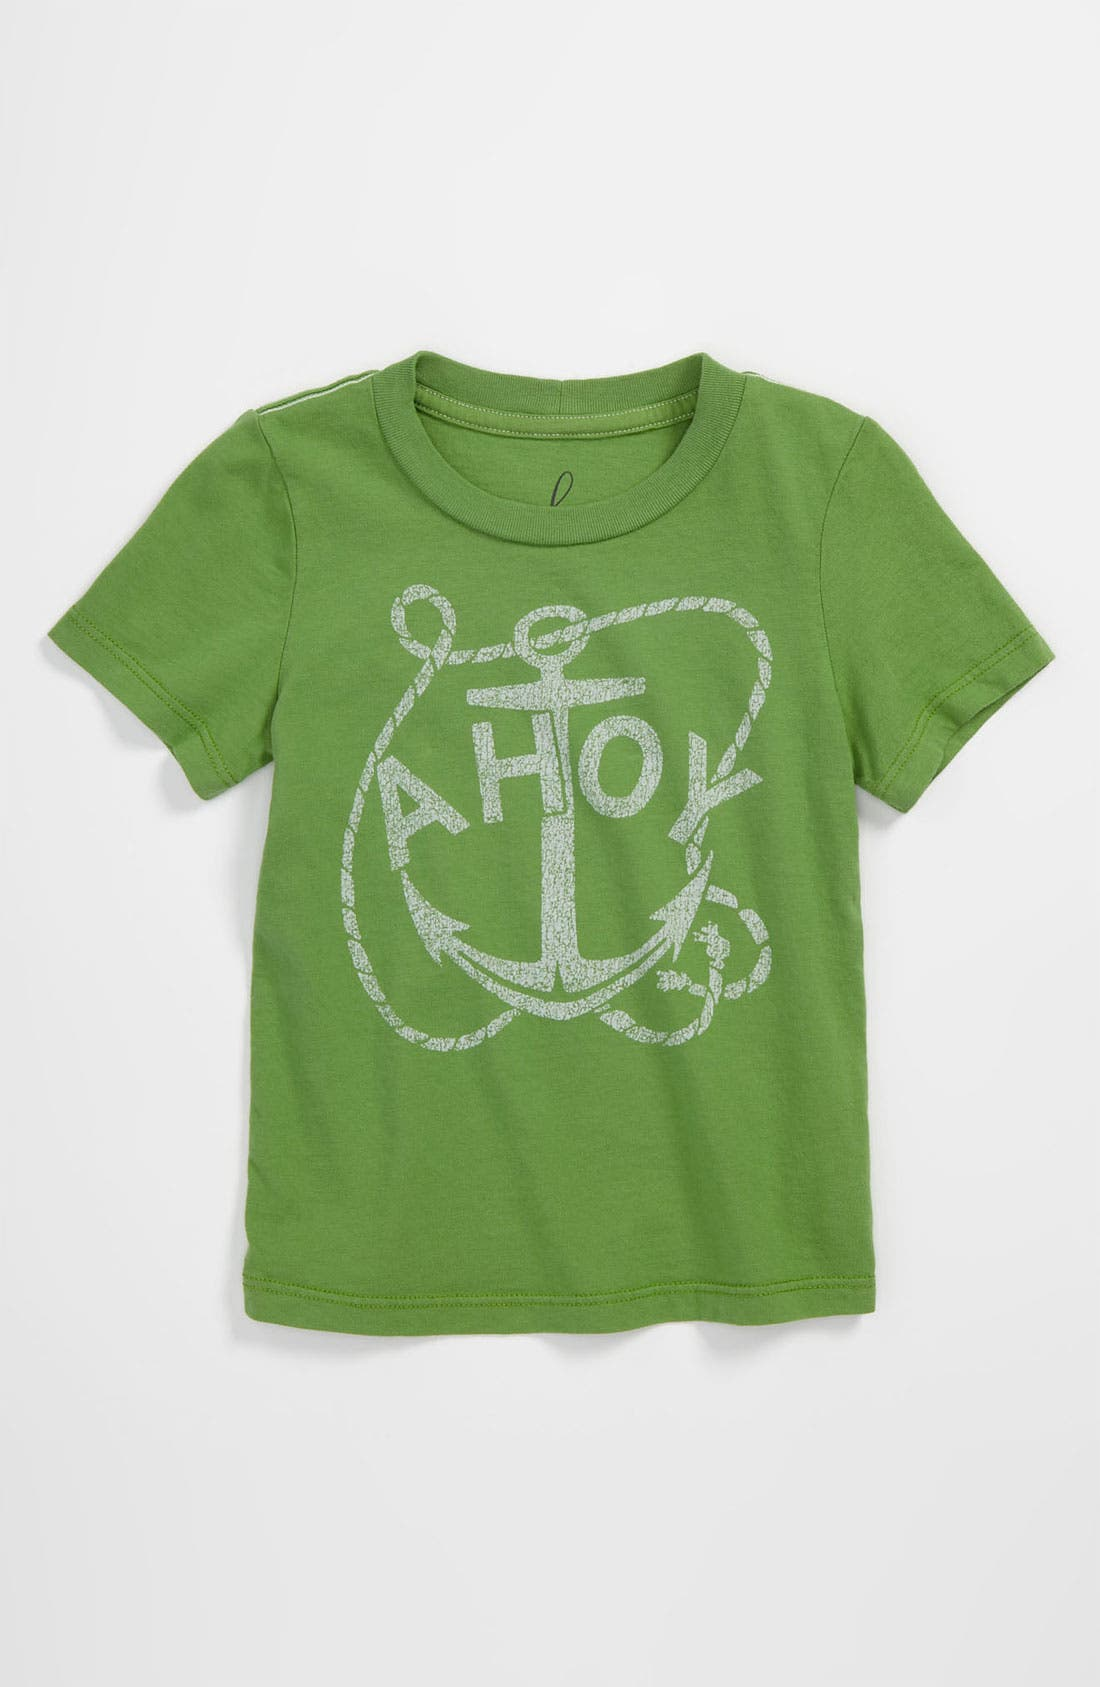 Alternate Image 1 Selected - Peek 'Ahoy' T-Shirt (Baby)